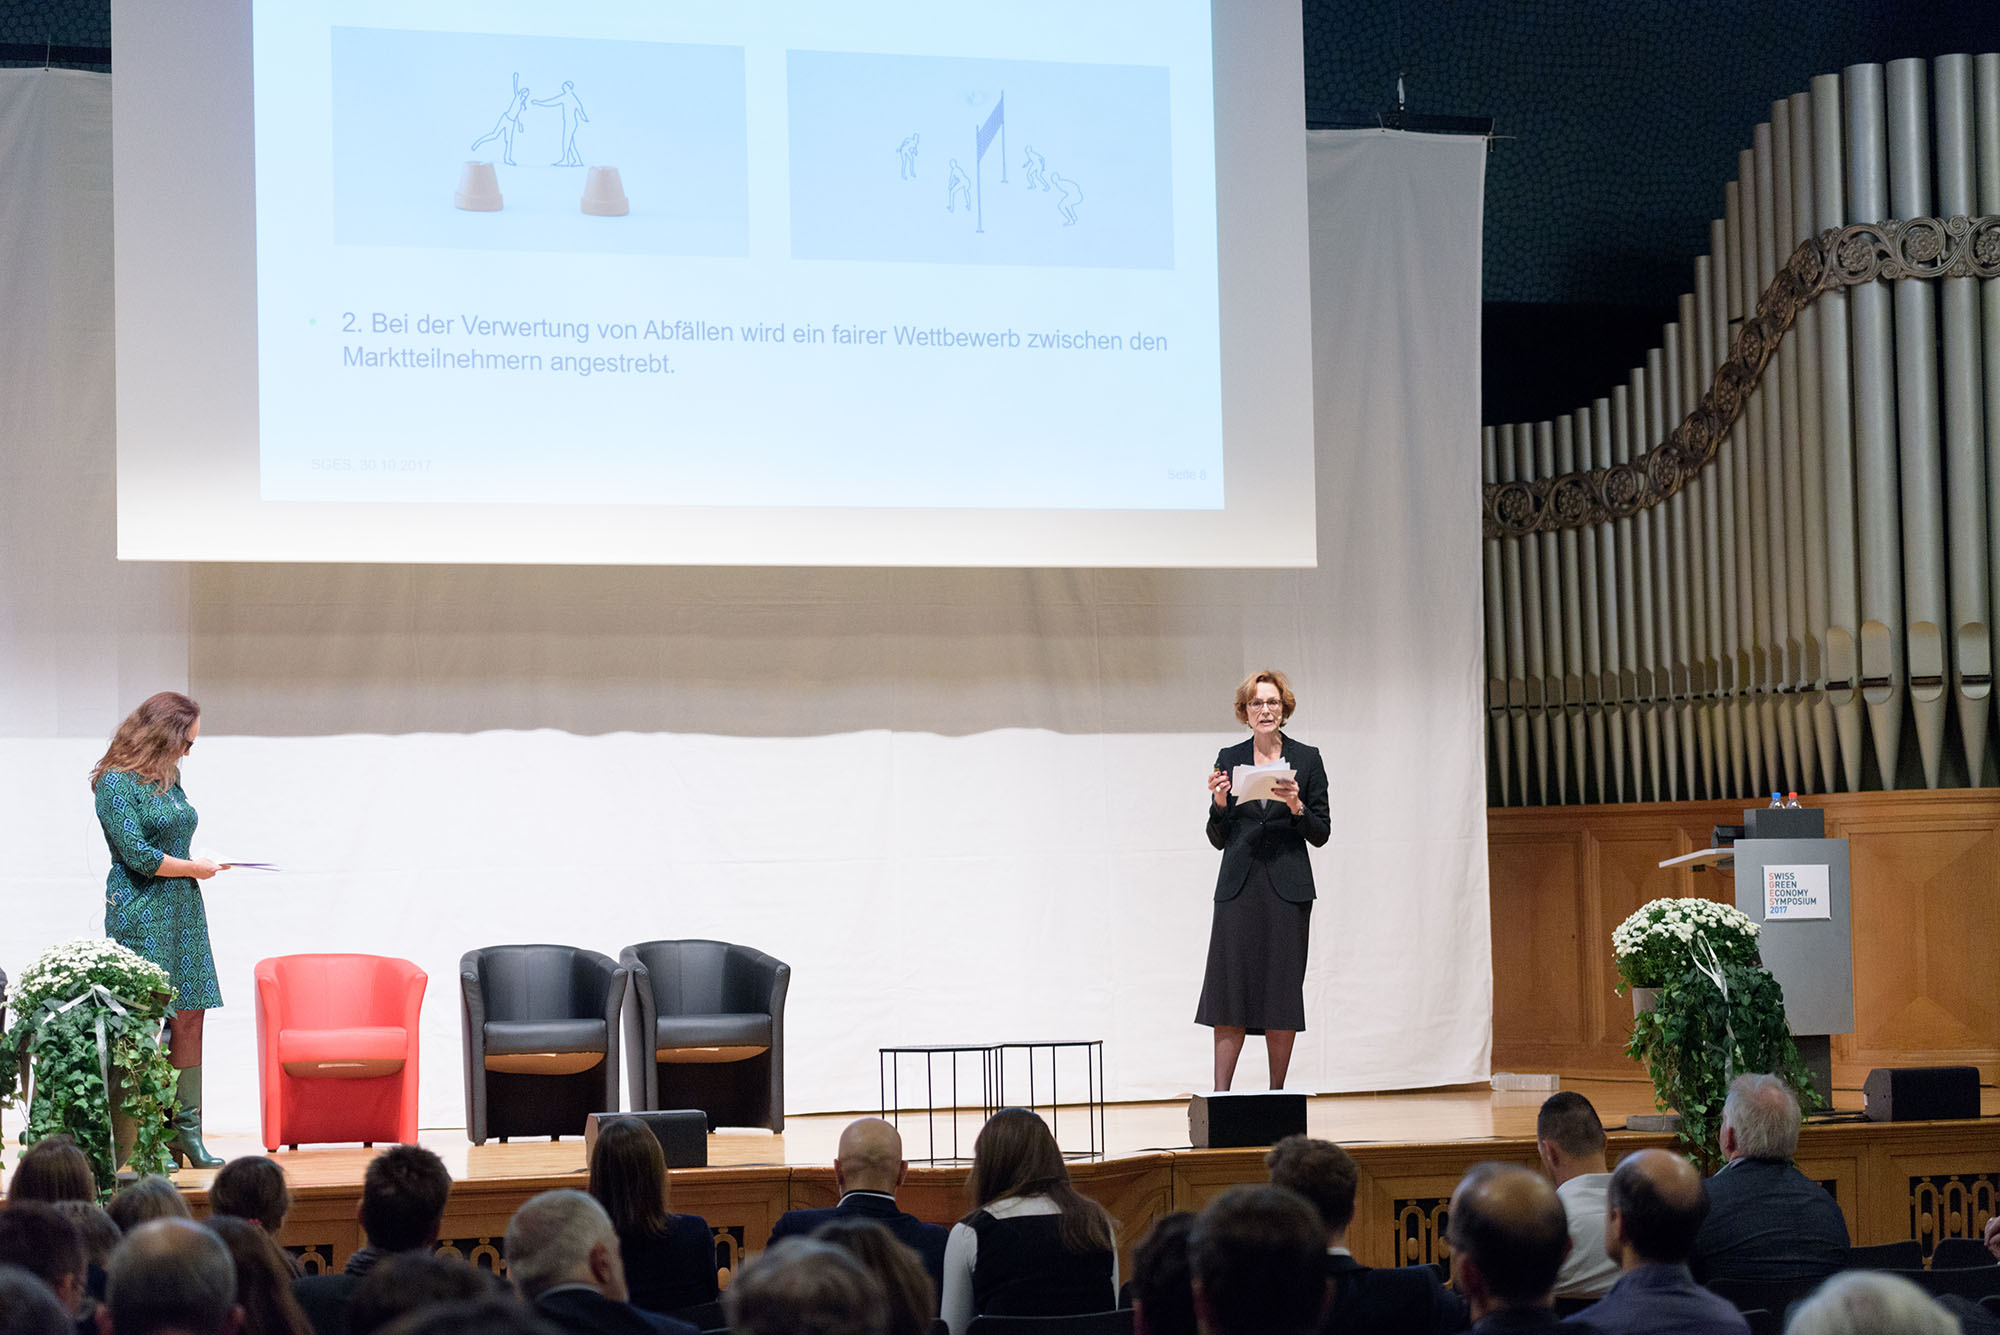 Karine Siegwart, Monika Rühl